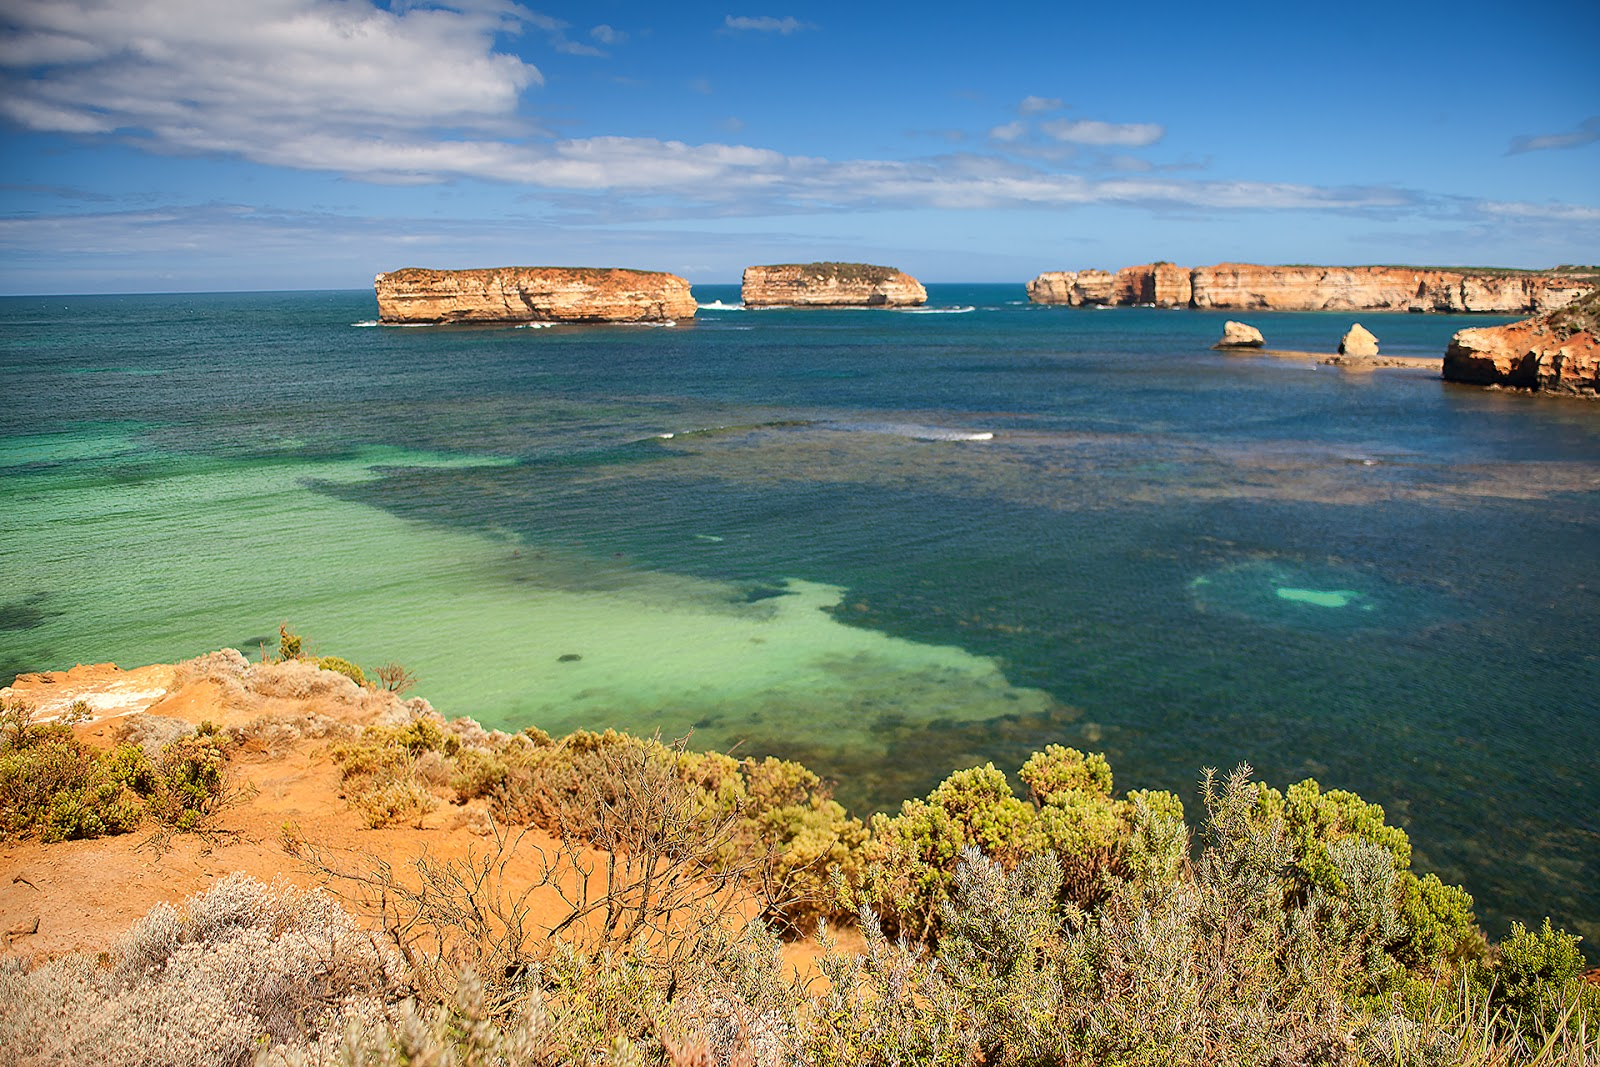 Bay of Islands,Great Ocean Road,formacje skalne